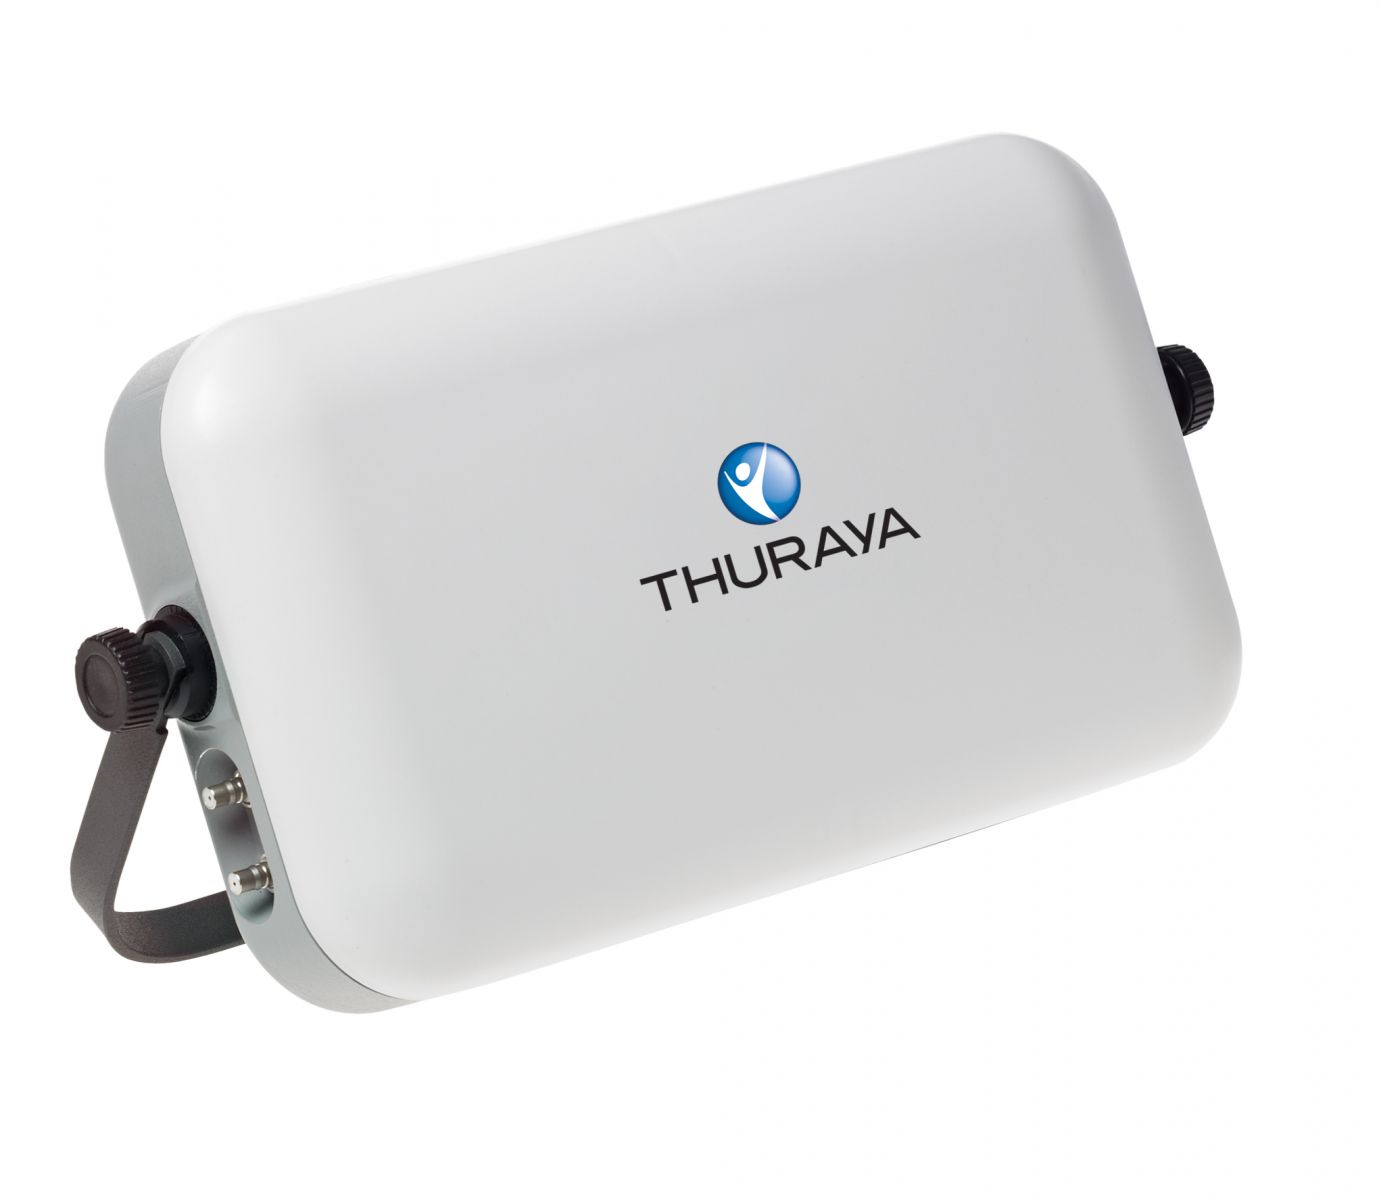 Спутниковый терминал Thuraya IP на базе ФАР